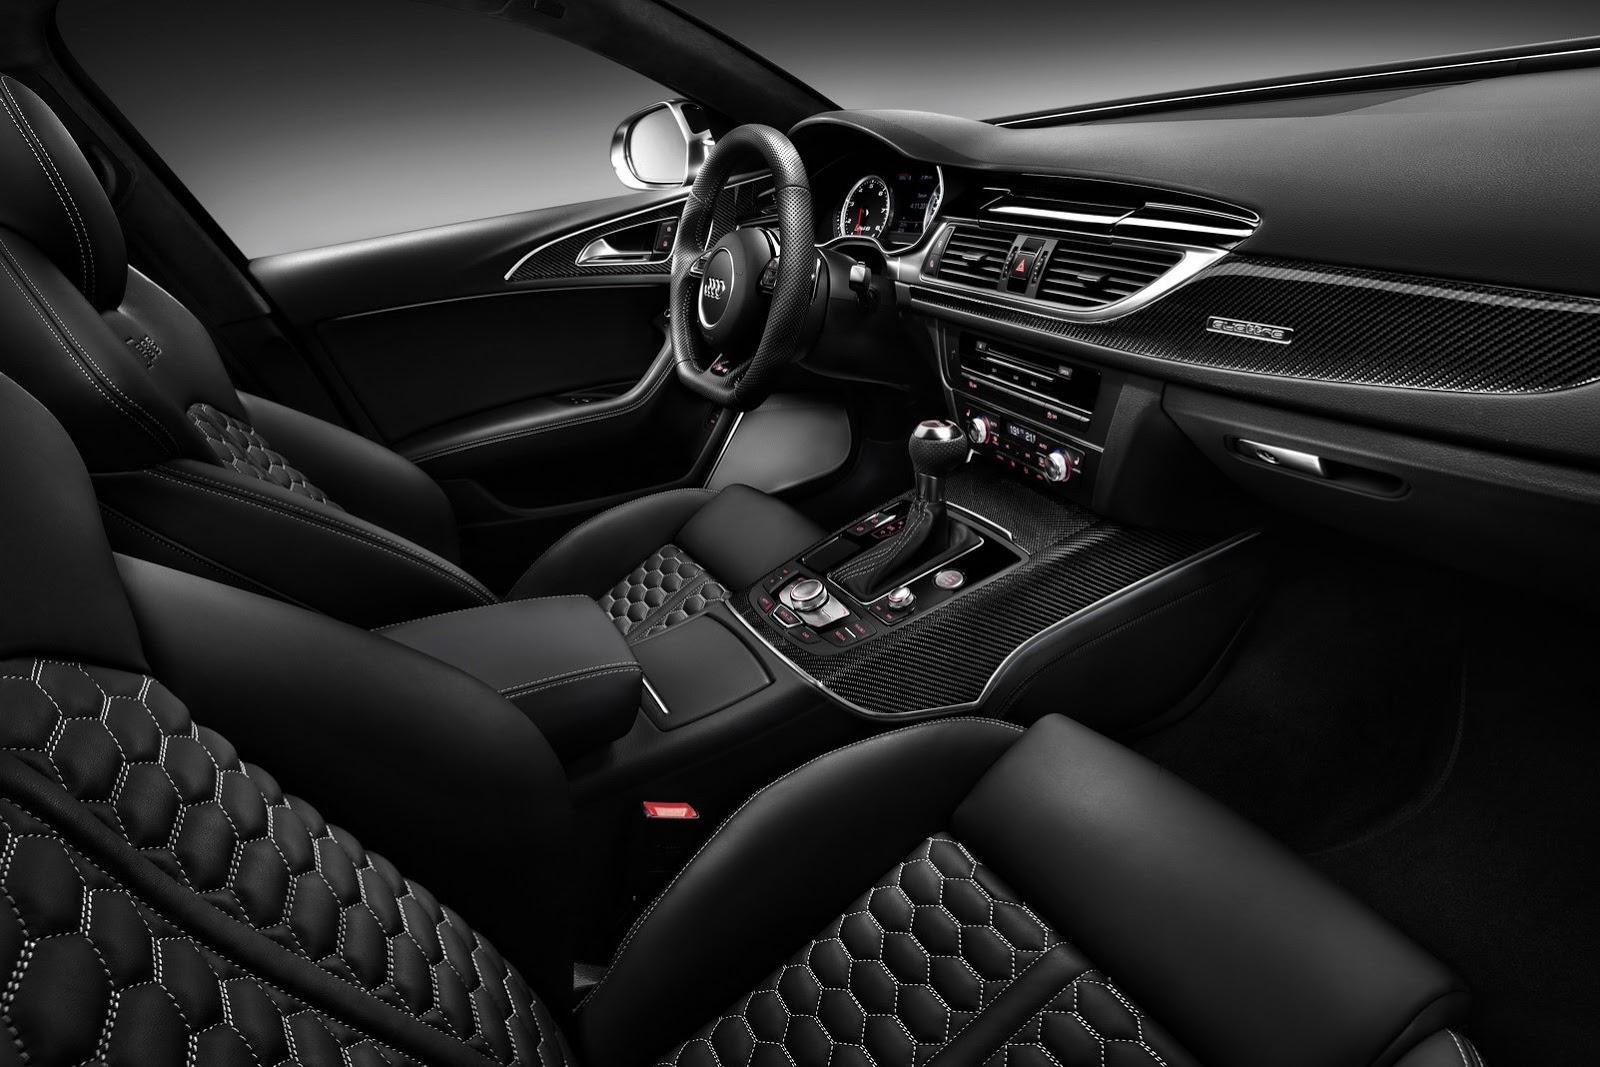 2014 Audi RS6 Avant Interior Angle